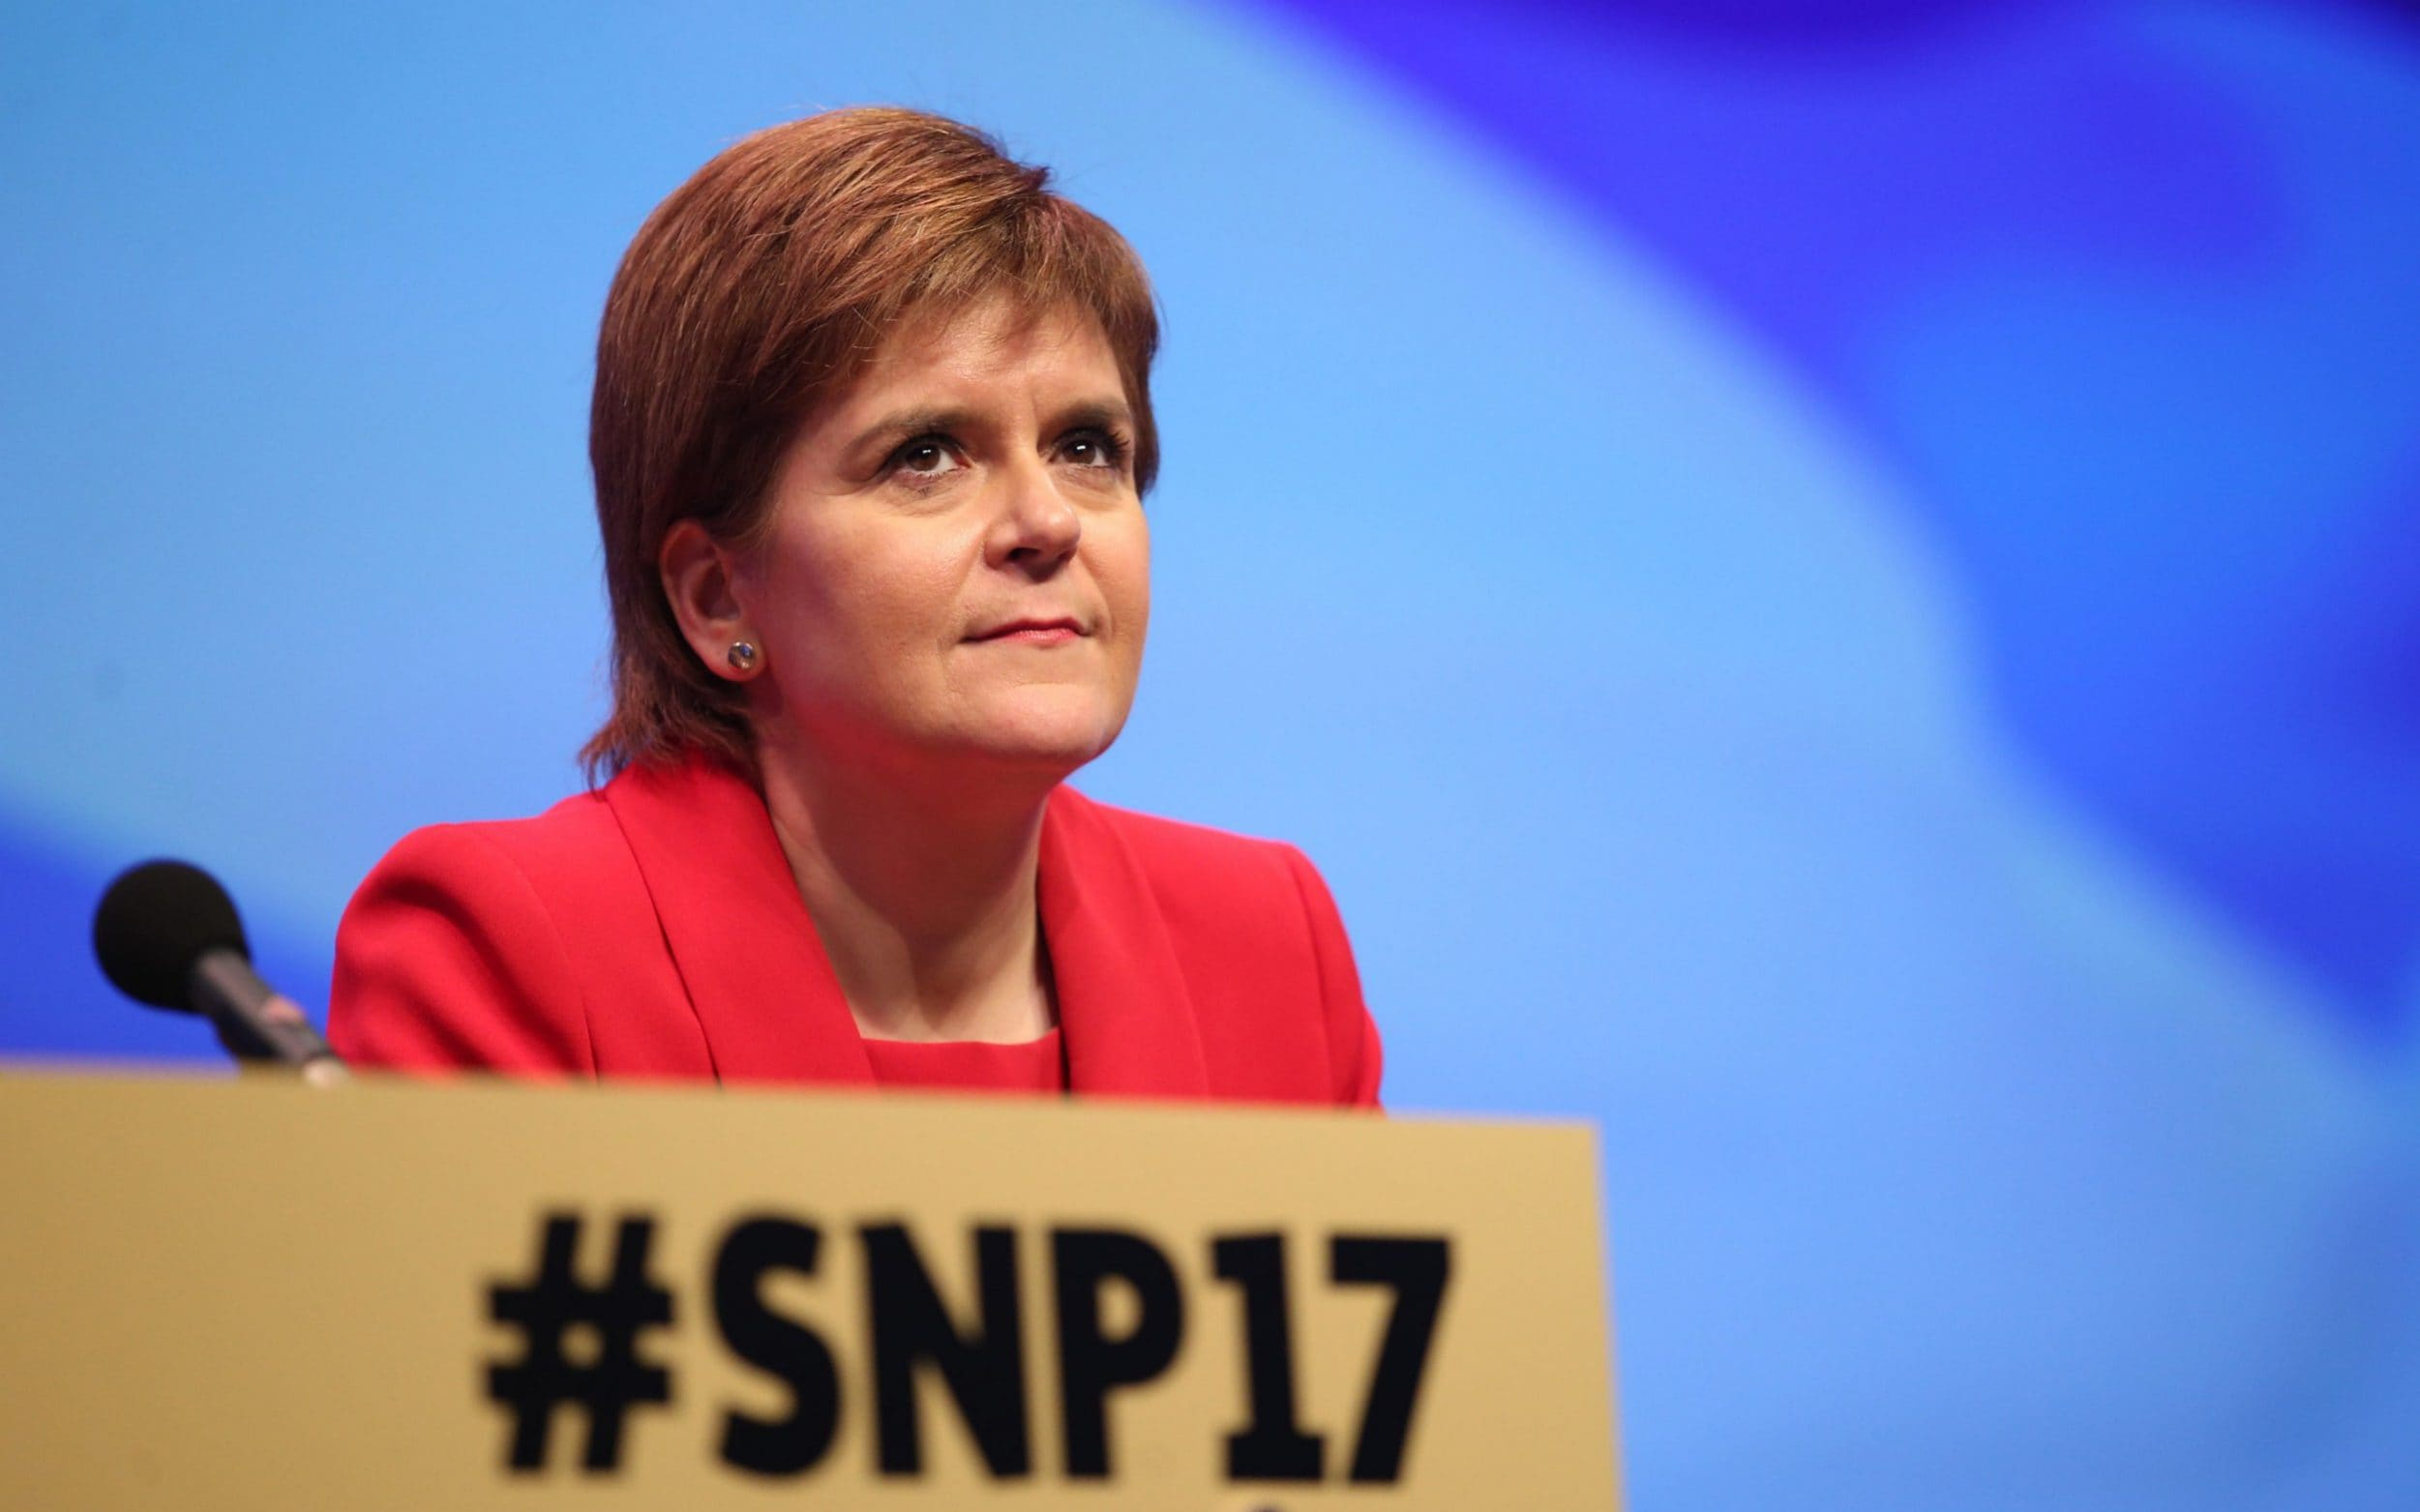 Nicola Sturgeon at the SNP conference on Monday